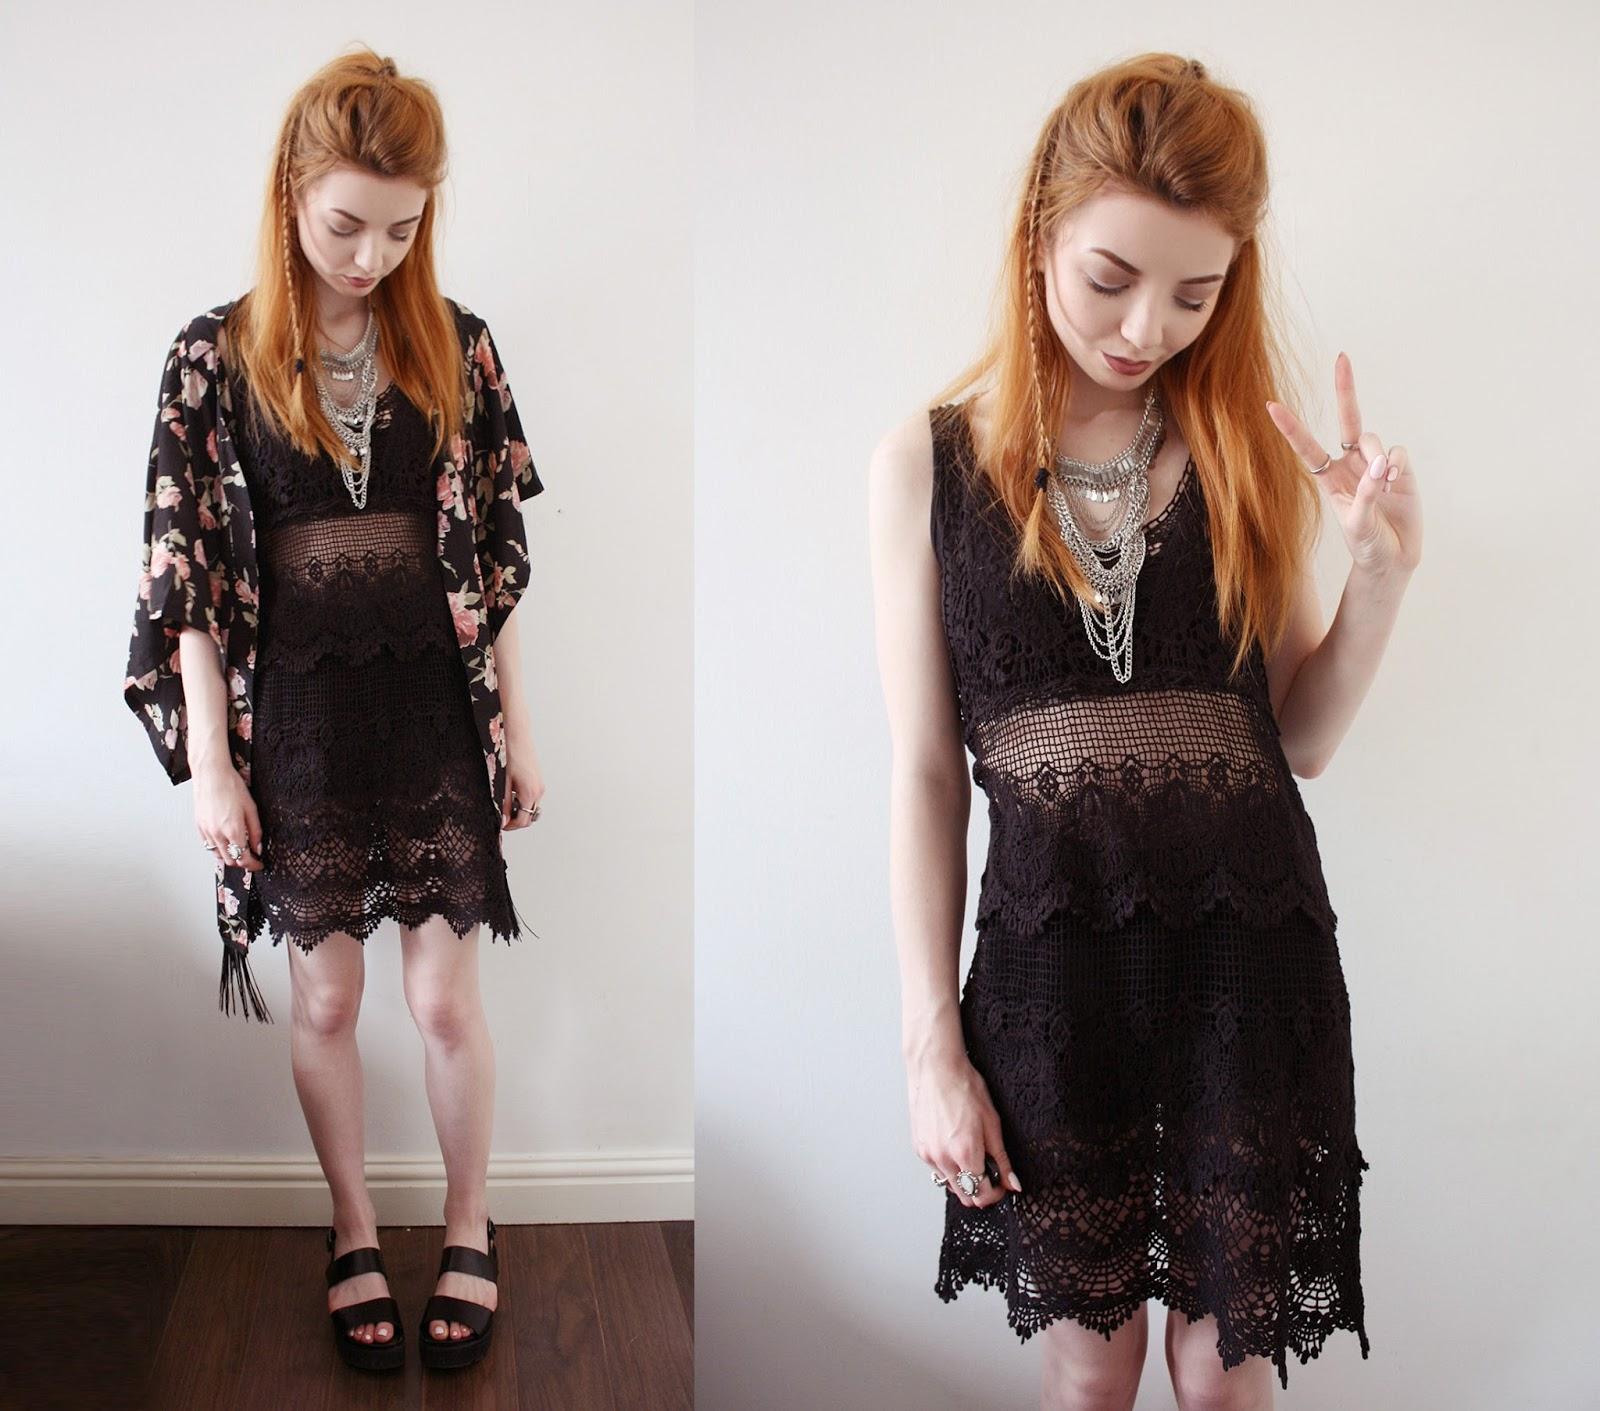 feb1e723b9f32 Dress – New Look* | Sandals – New Look* | Kimono – Missguided* | Necklace –  Primark